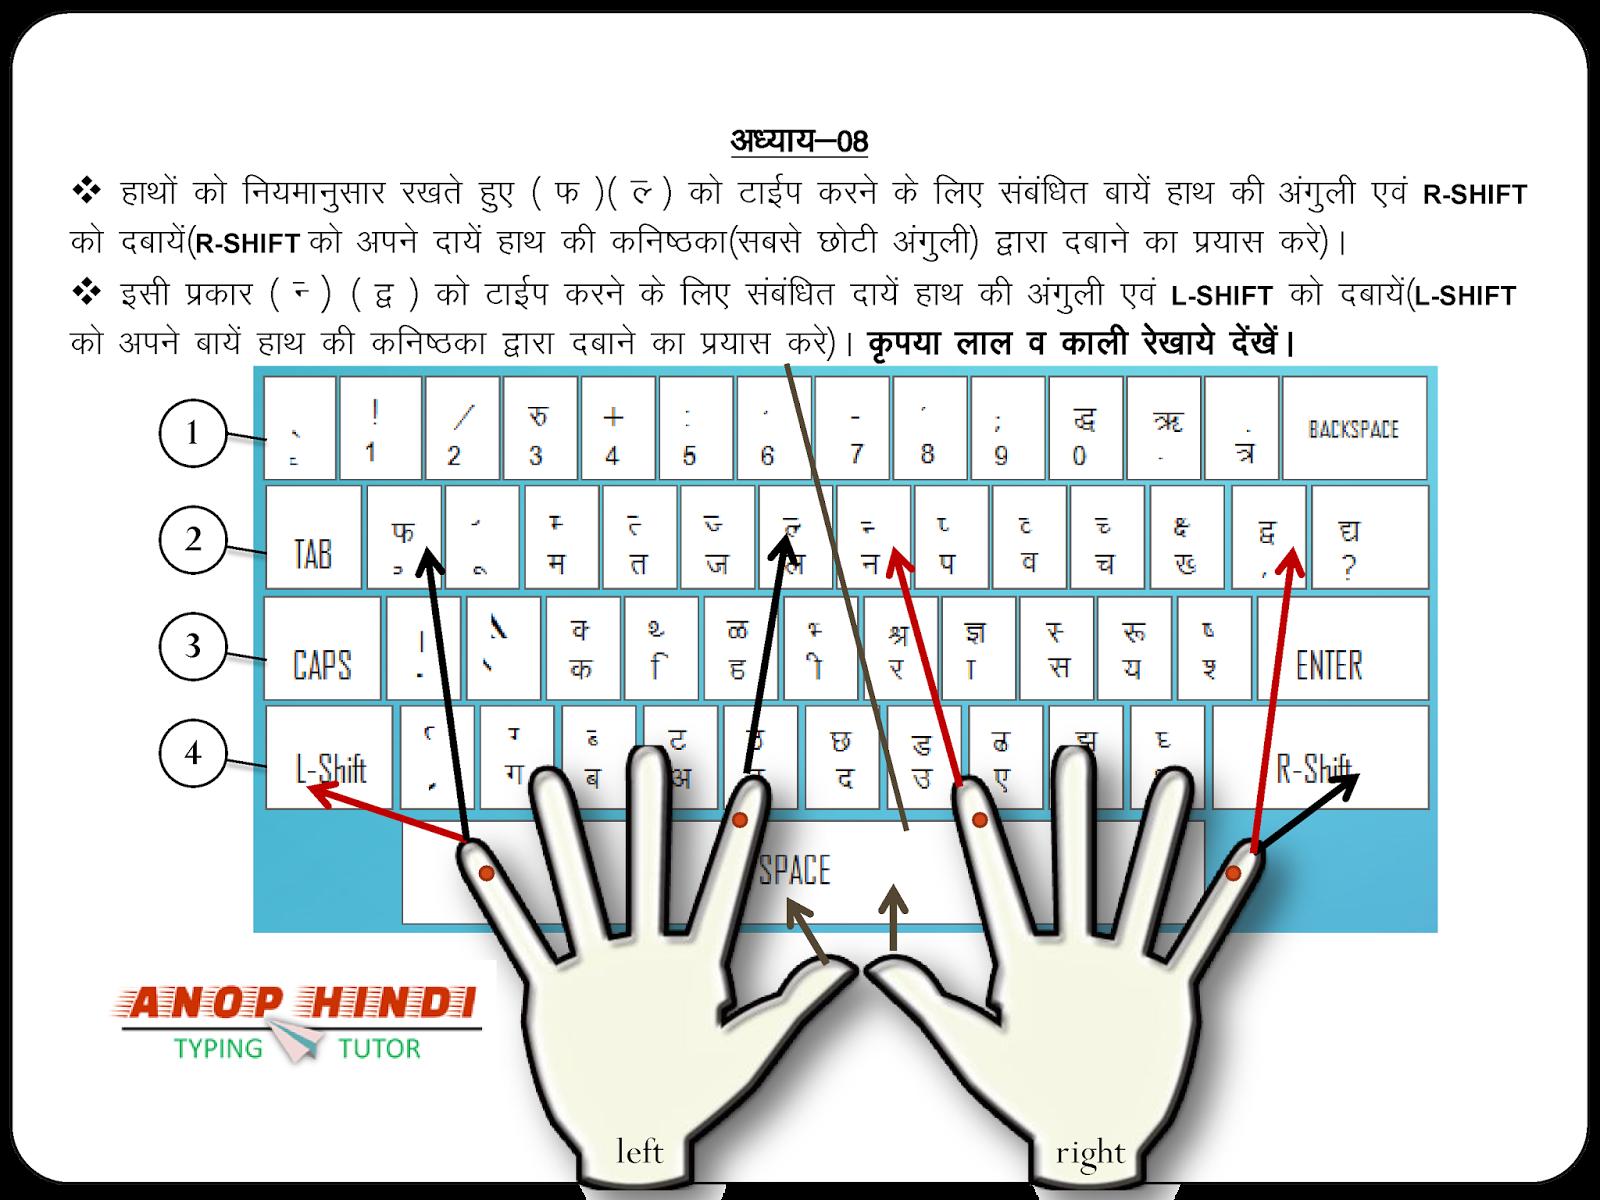 Anop Hindi Typing Tutor - Lesson 8